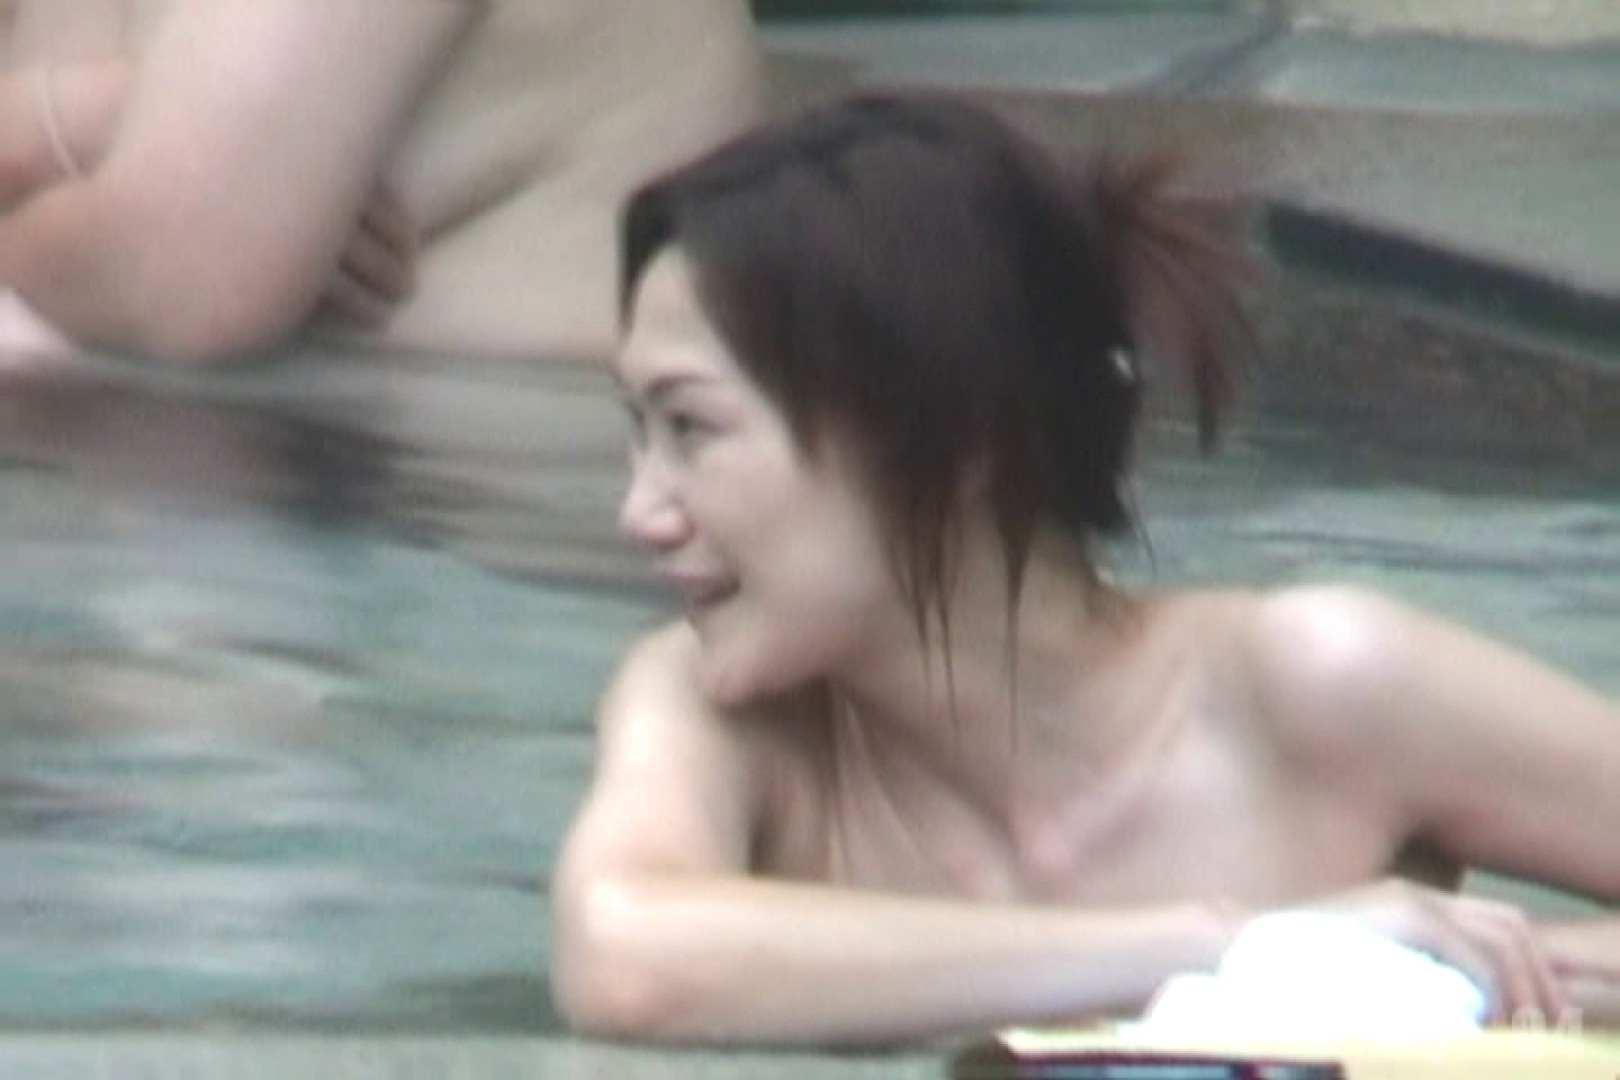 Aquaな露天風呂Vol.739 0  95連発 72